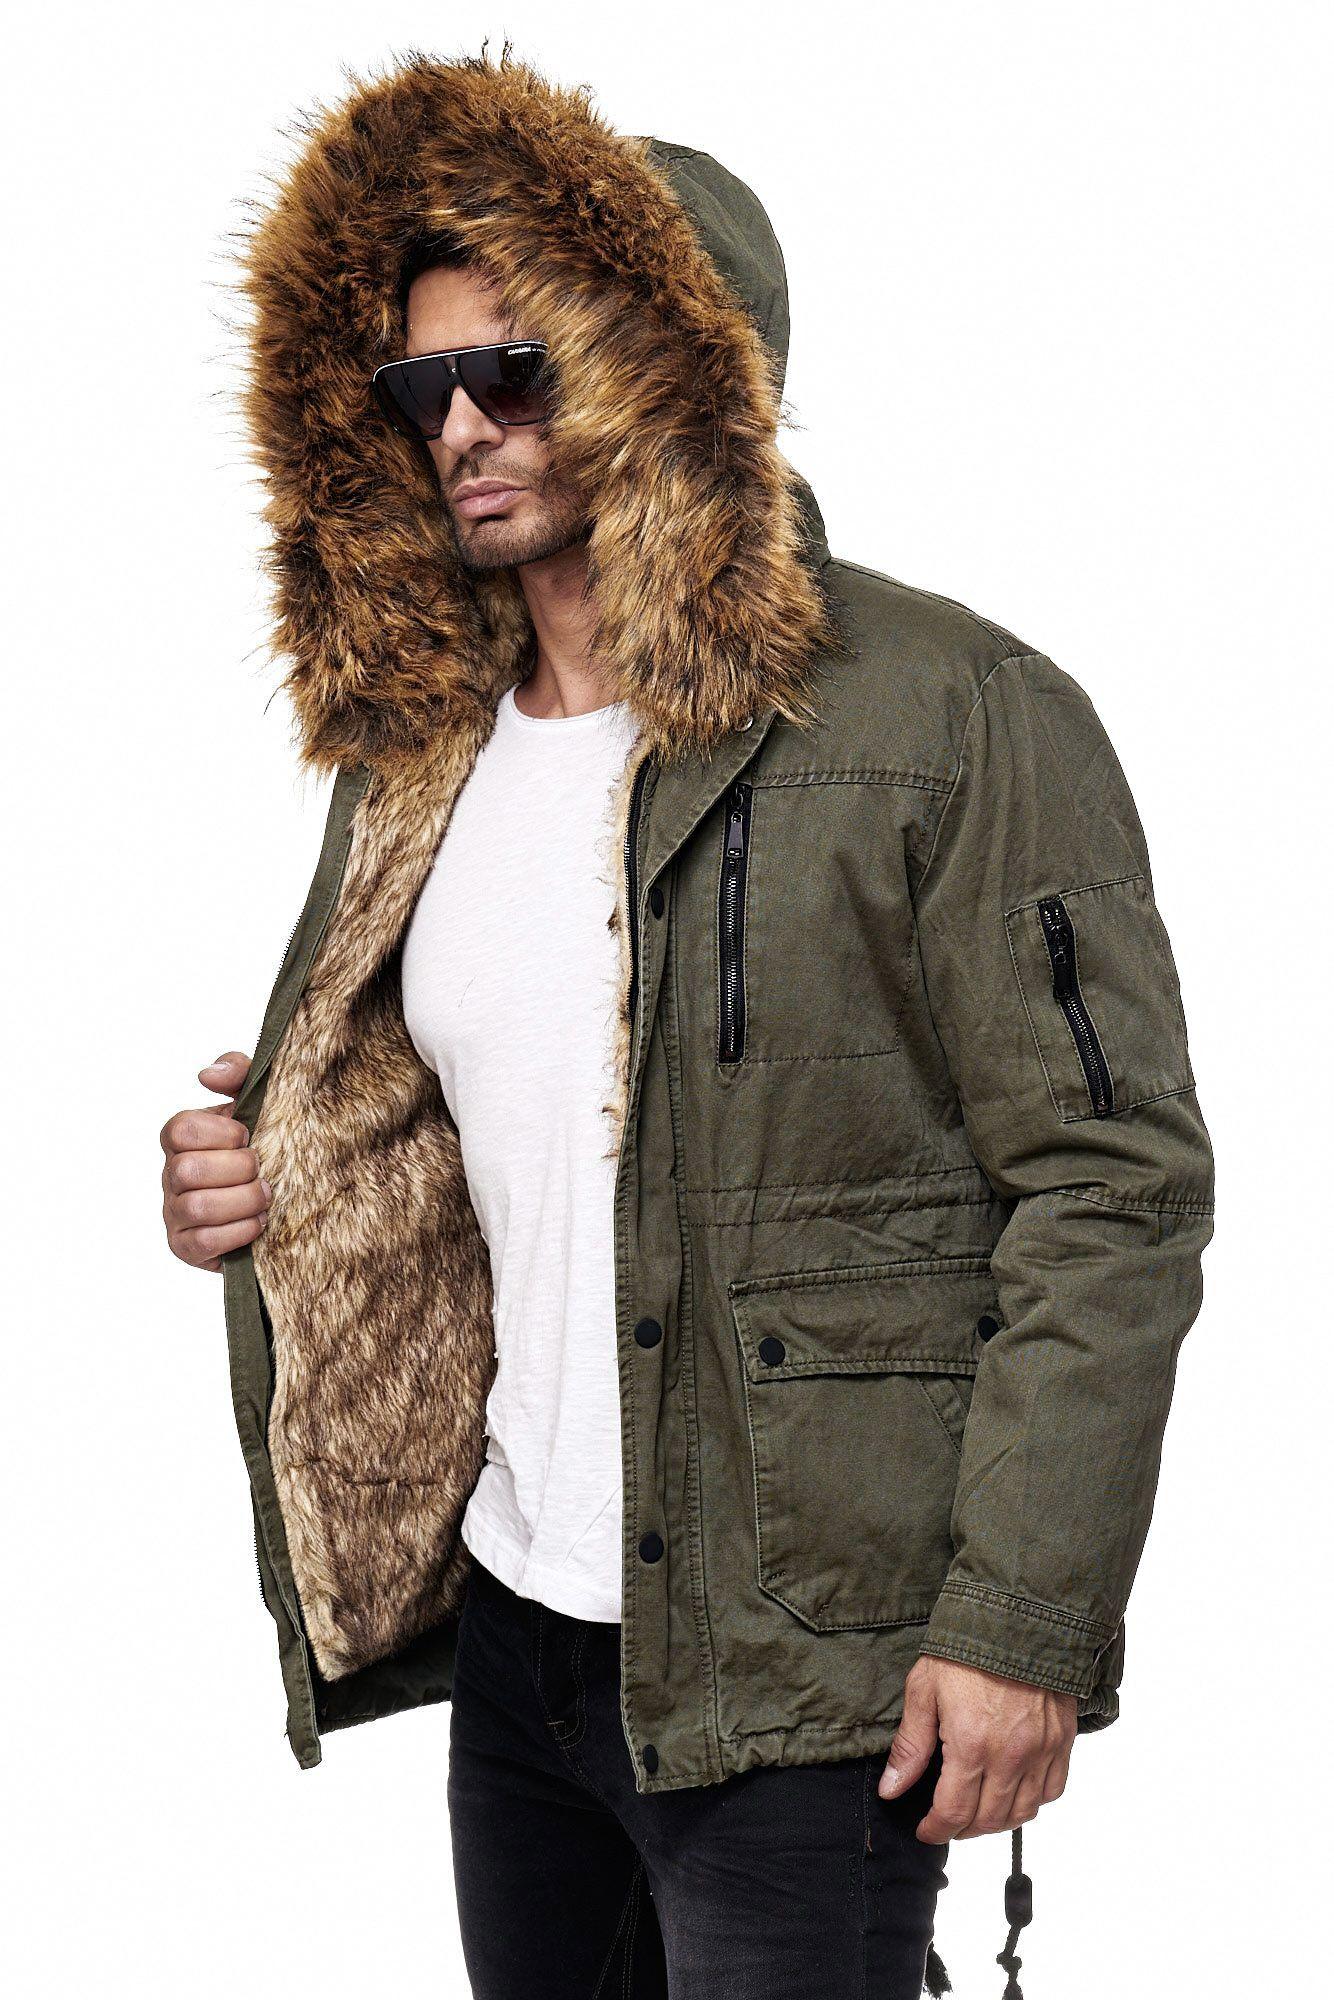 Redbridge Herren Winterjacke Jacke Parka Mantel Mens Jacket Fell Fur Olive El Patron Herbst Jacken Herren Manner Jacken Jacken